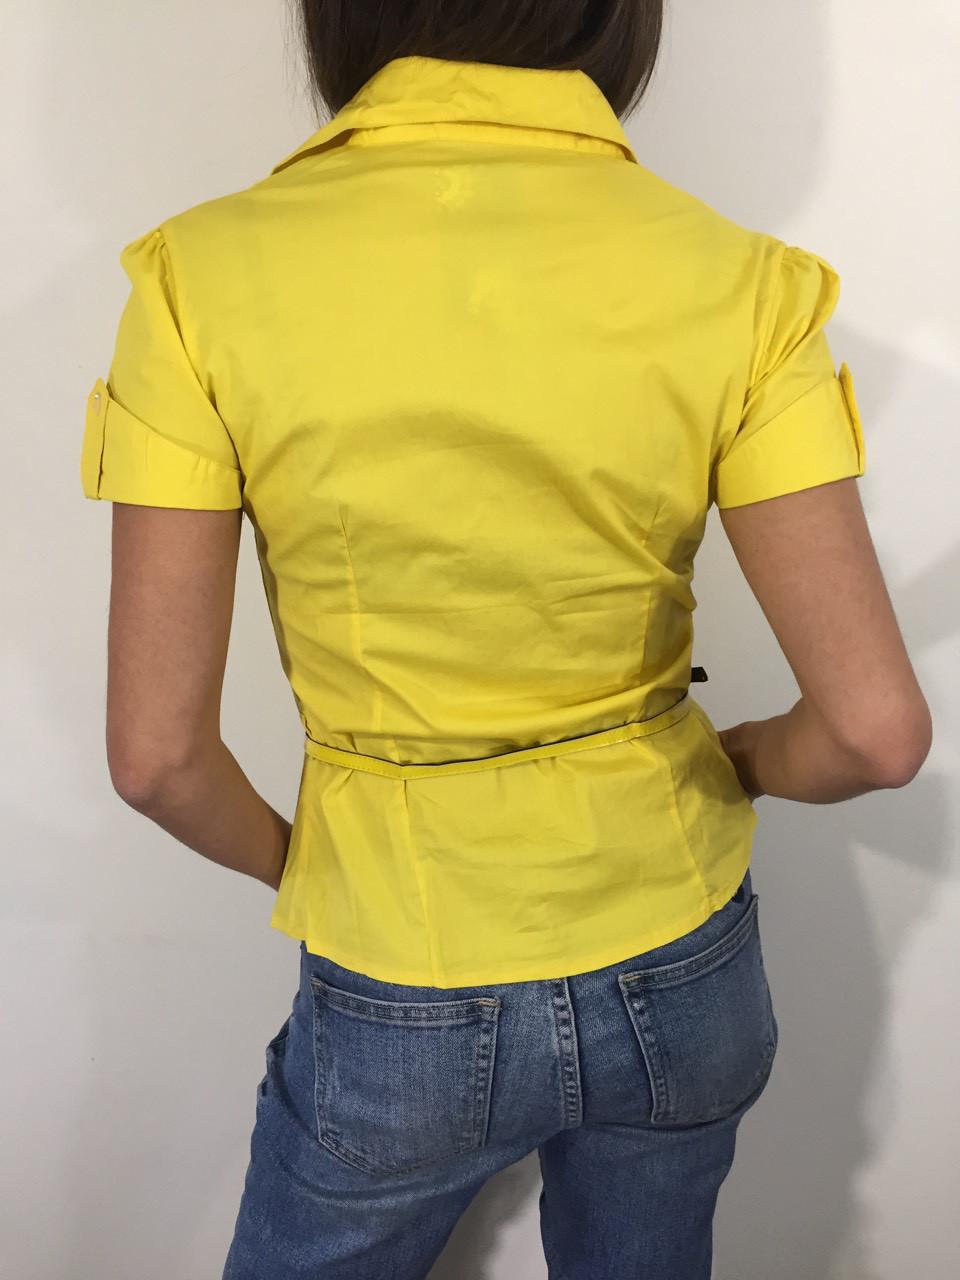 cadd2e63226 Рубашка женская А 84 желтая